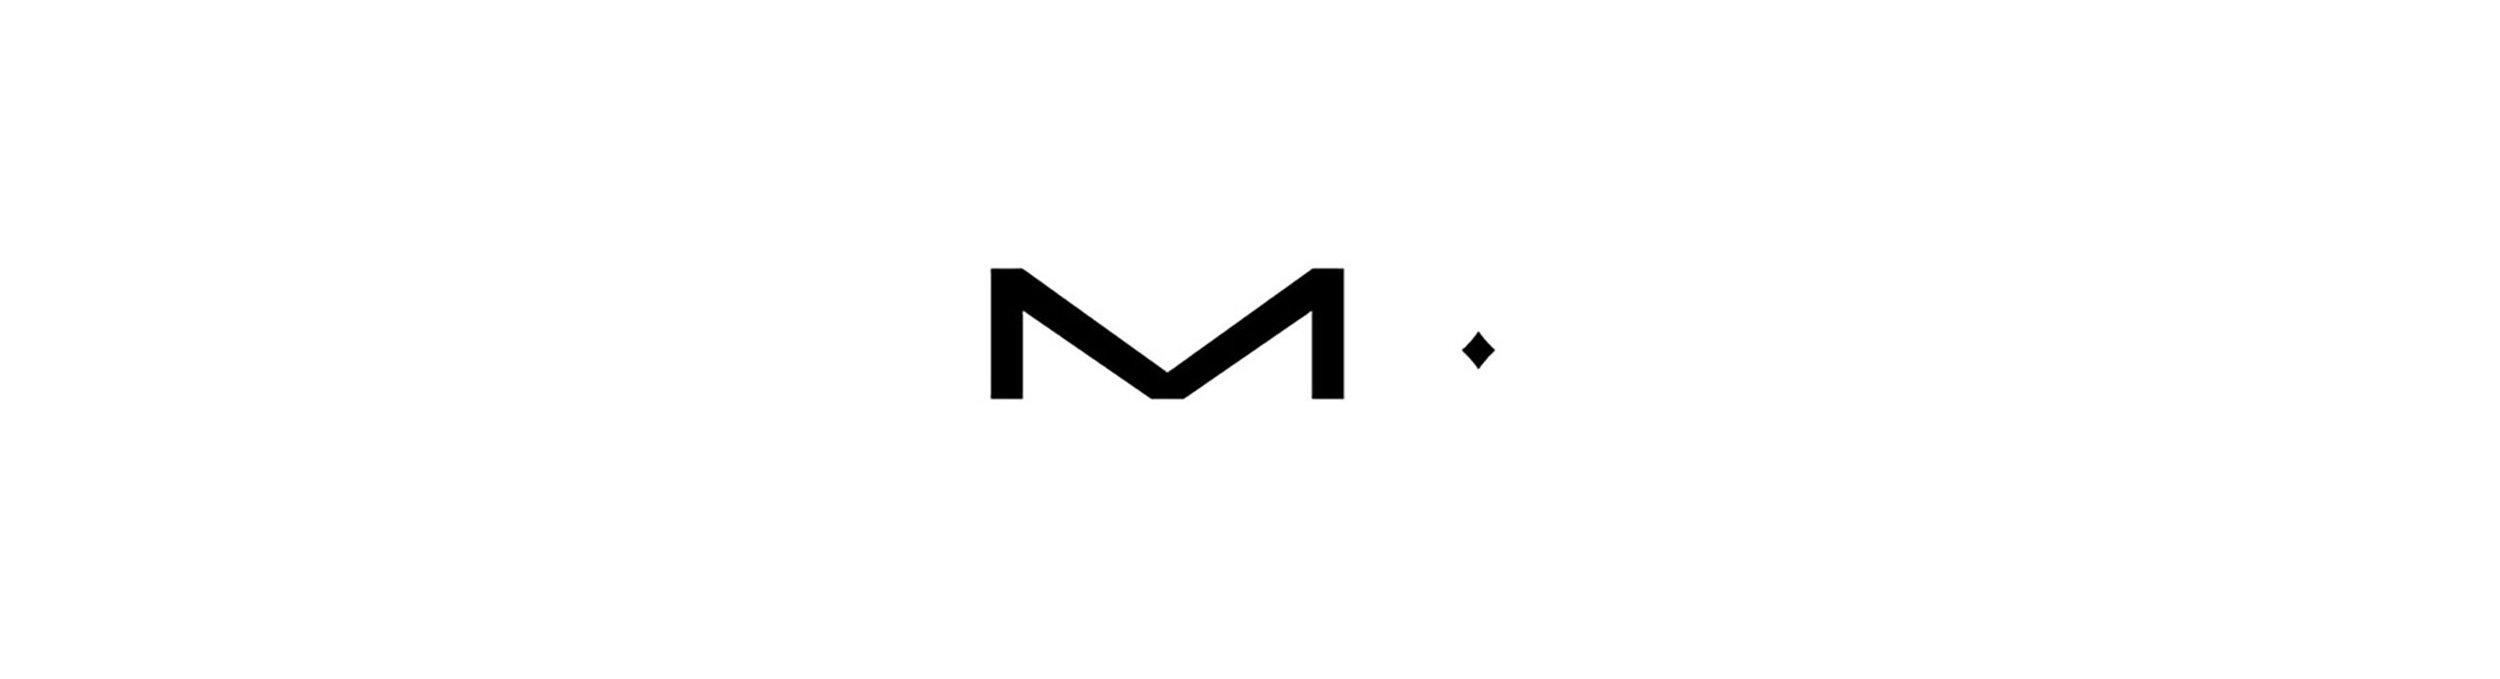 mosaique_logo.jpg